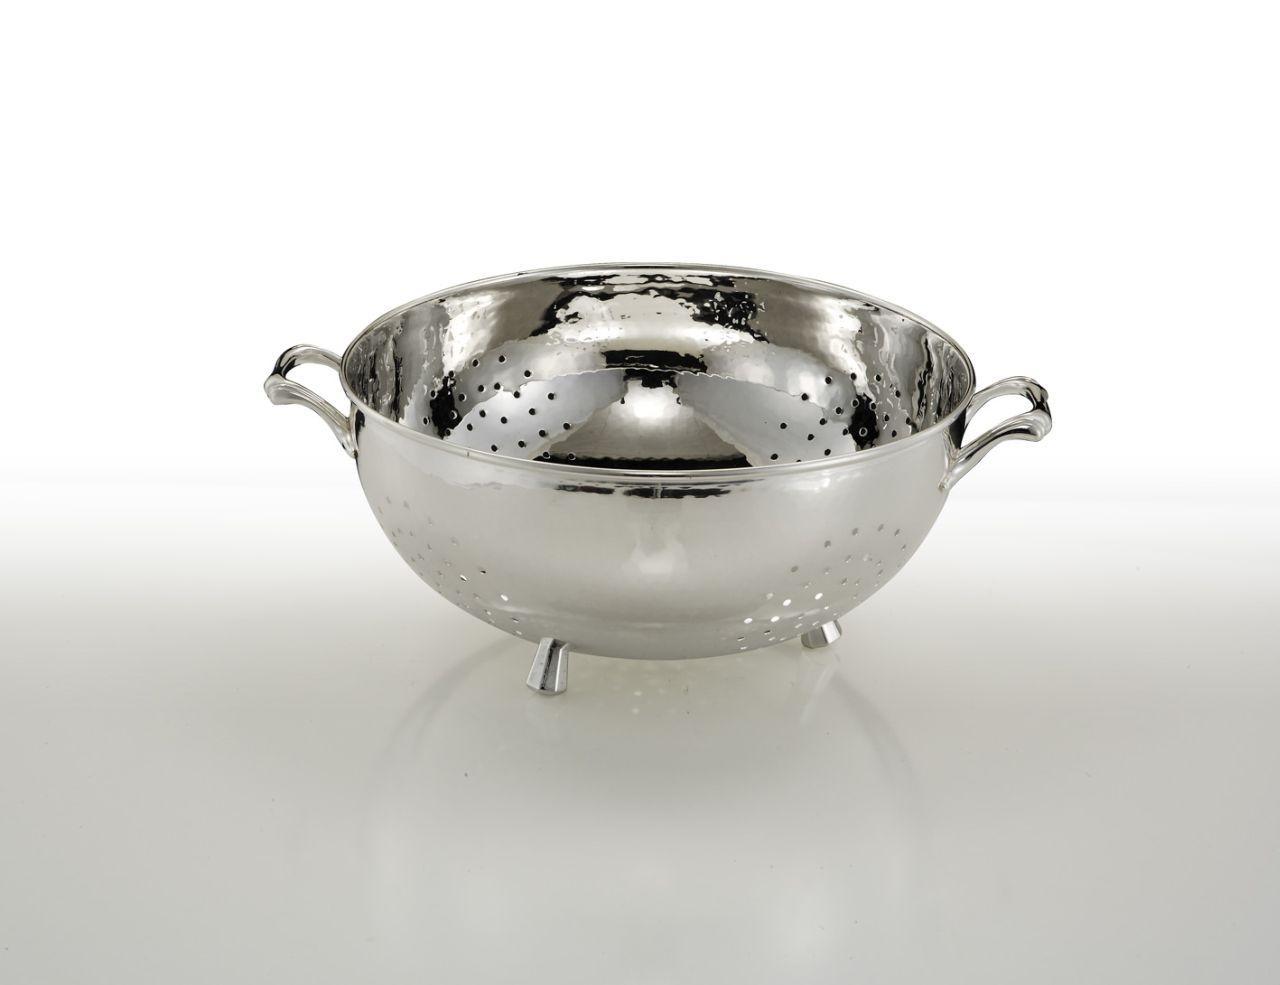 Scolapasta argentato argento sheffield argento stile Cardinale